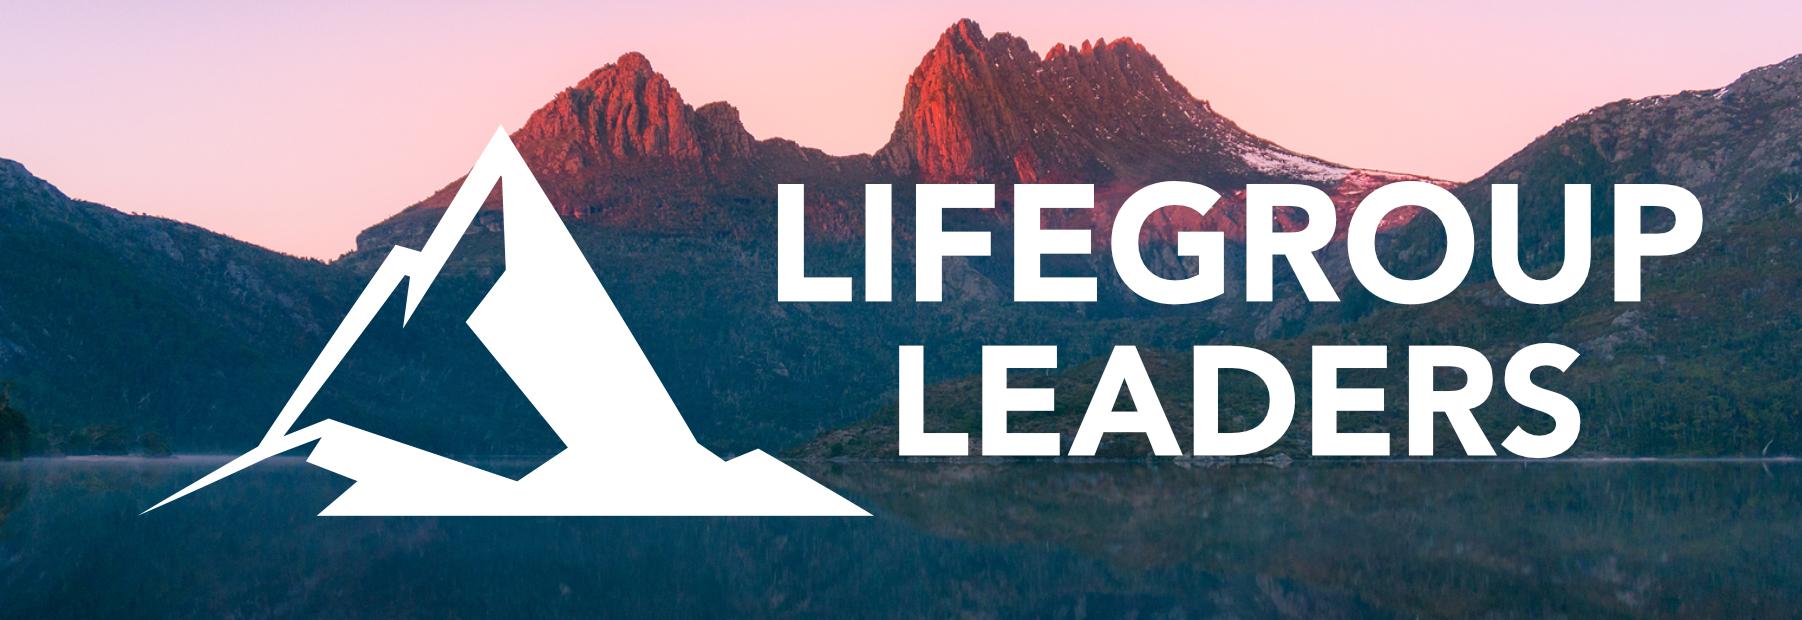 LifeGroup Leaders Commitment webbanner.jpg